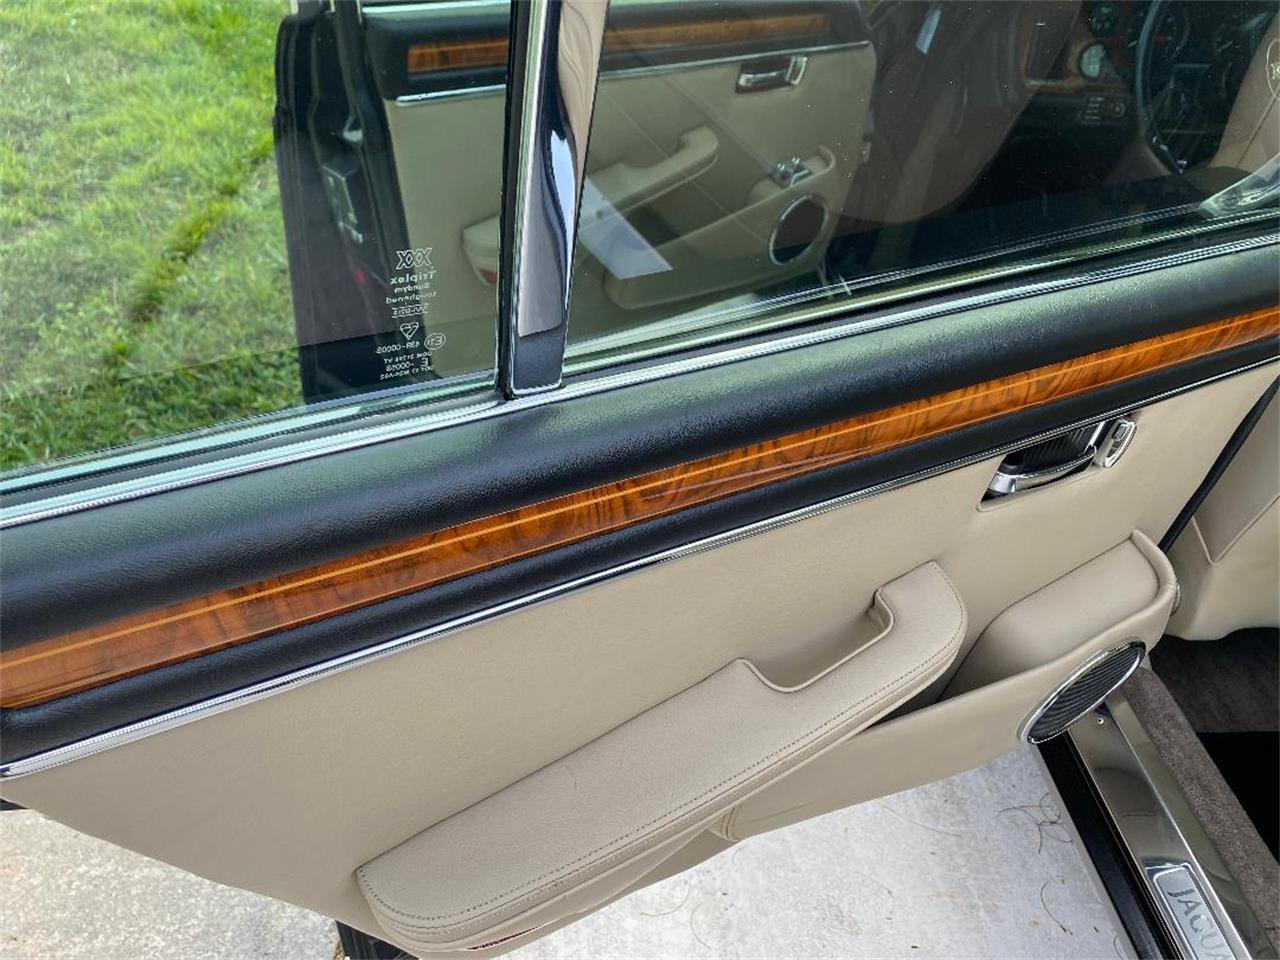 1987 Jaguar XJ6 (CC-1318844) for sale in BOCA RATON, Florida